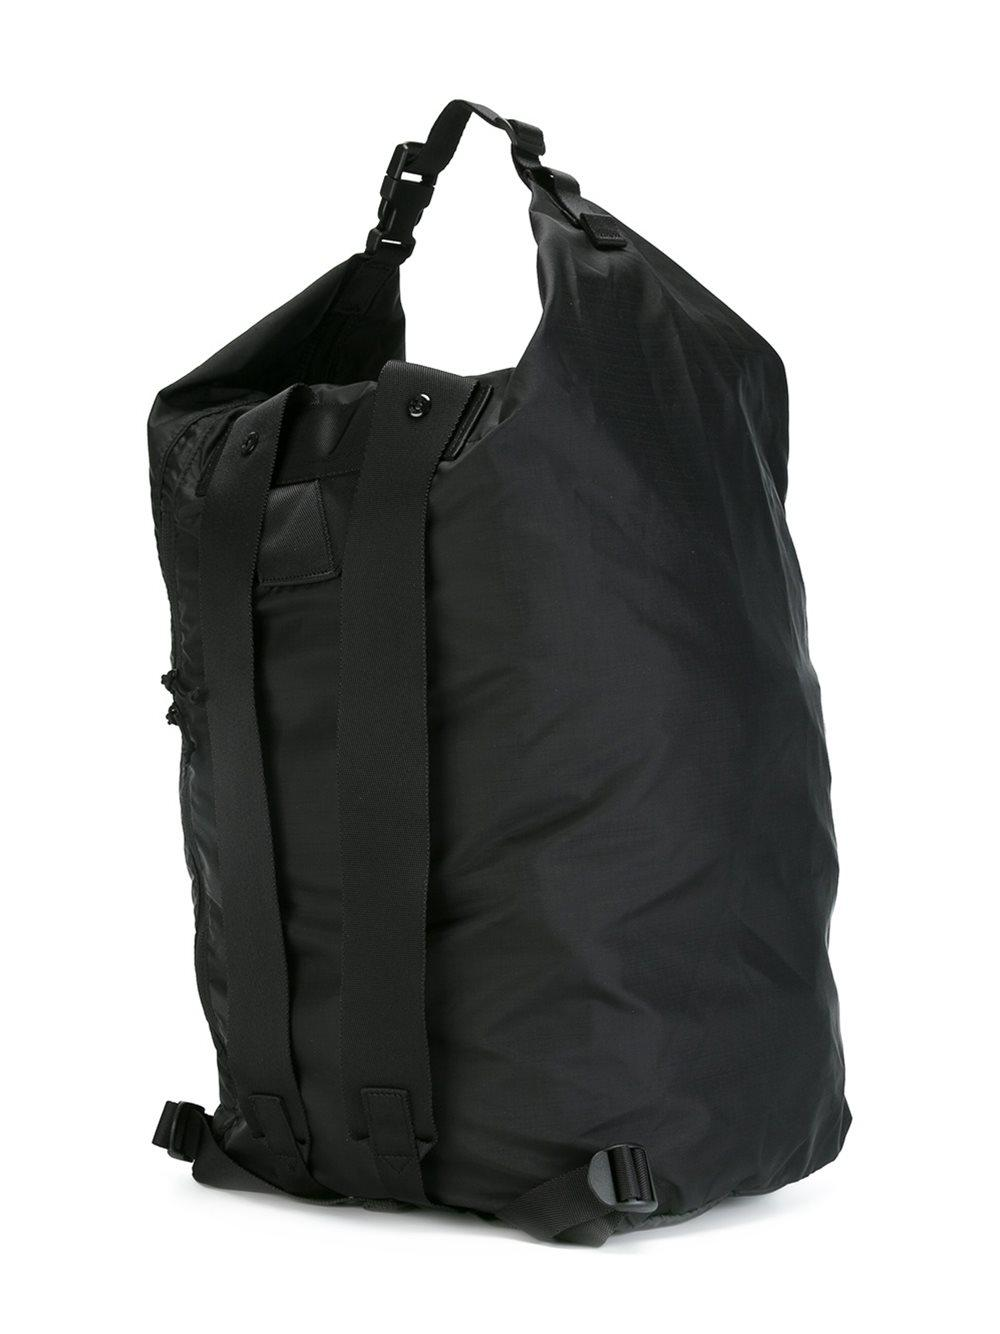 398d4a33b9ce Lyst - Porter  flex  Oversize Backpack in Black for Men